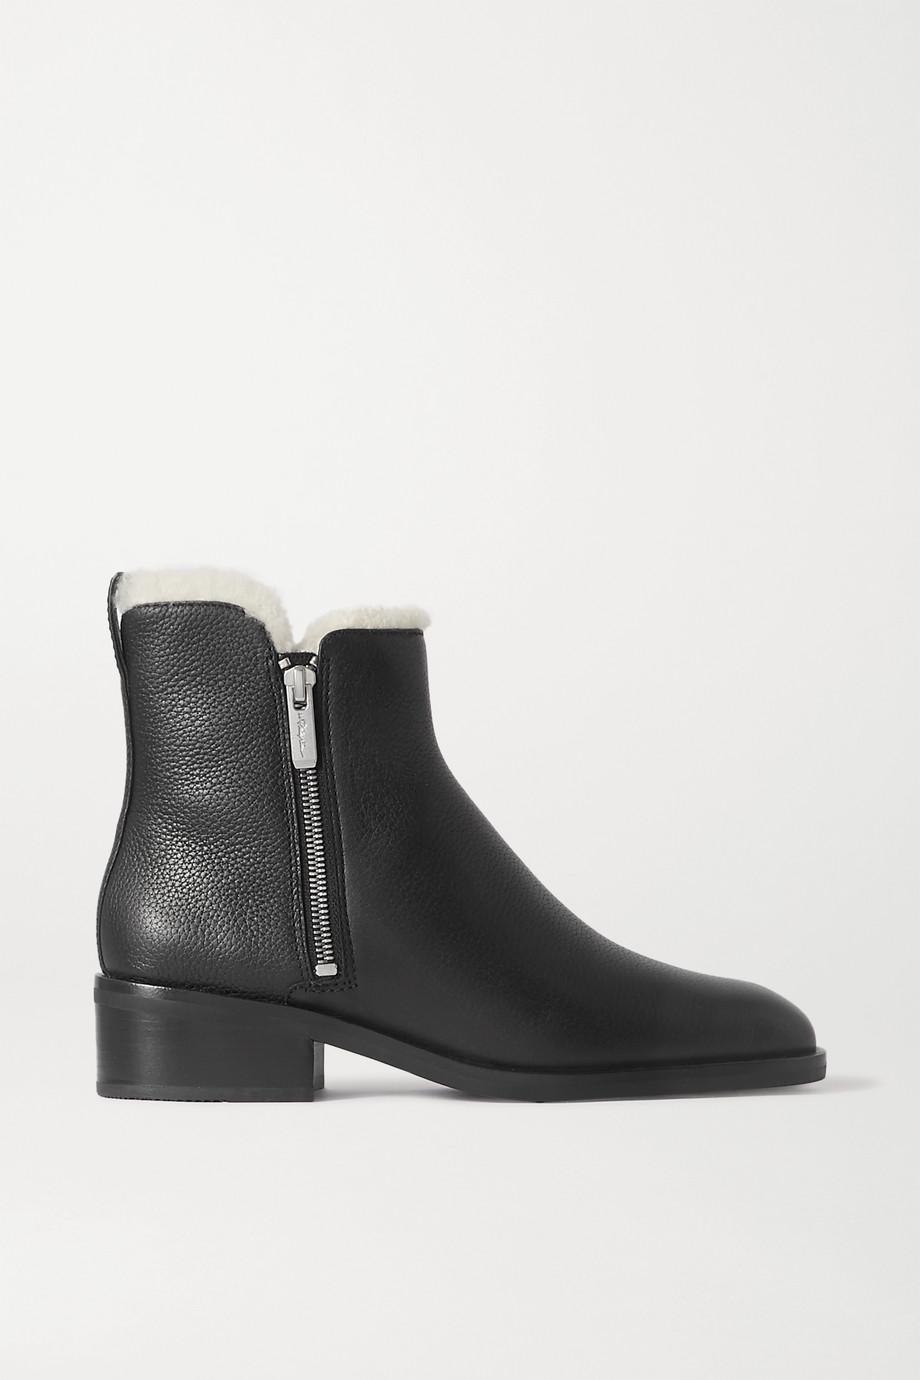 3.1 Phillip Lim Alexa 羊毛皮衬里纹理皮革踝靴